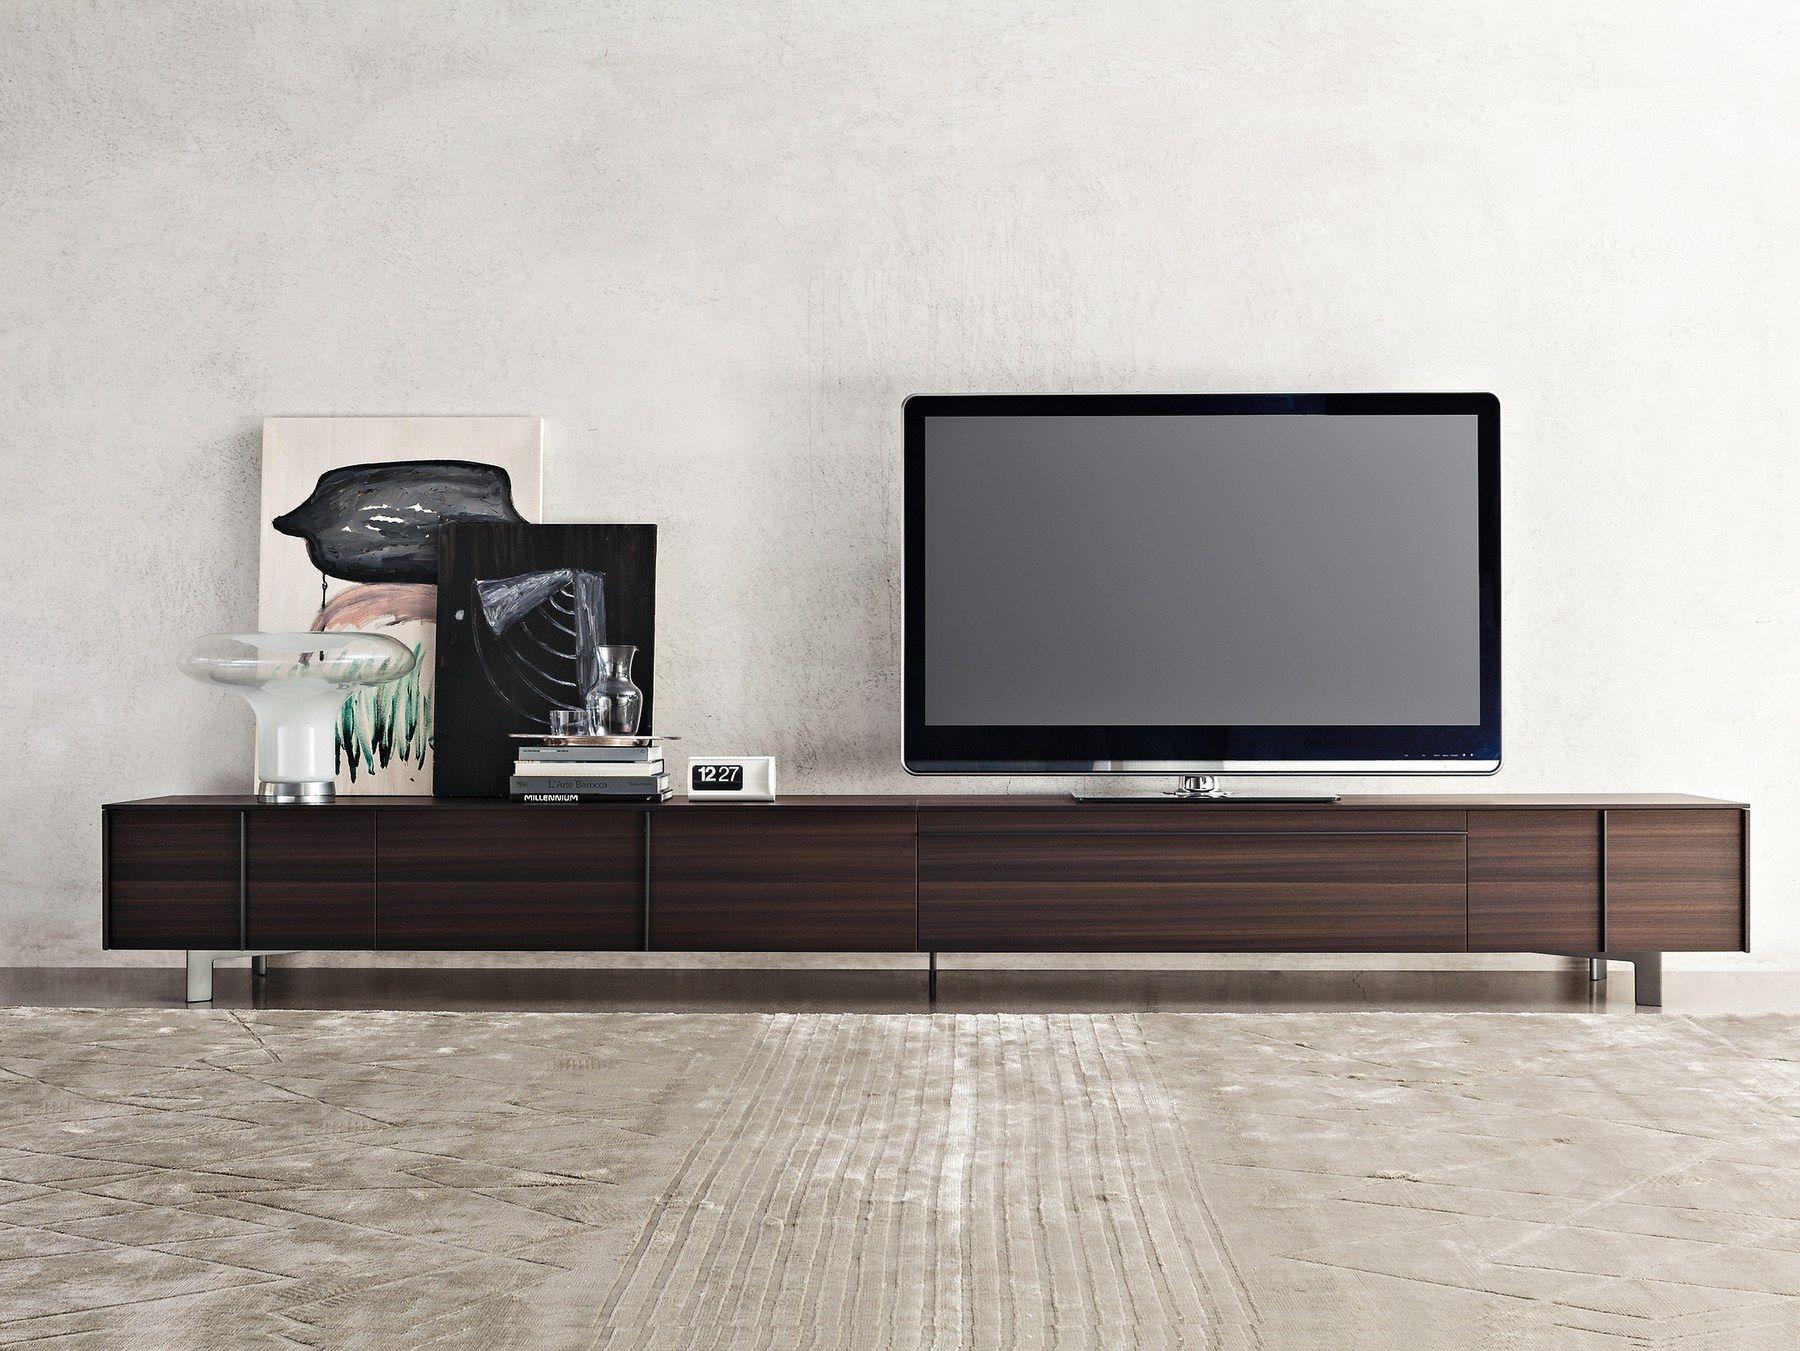 google pinterest storage walls and modern interiors. Black Bedroom Furniture Sets. Home Design Ideas